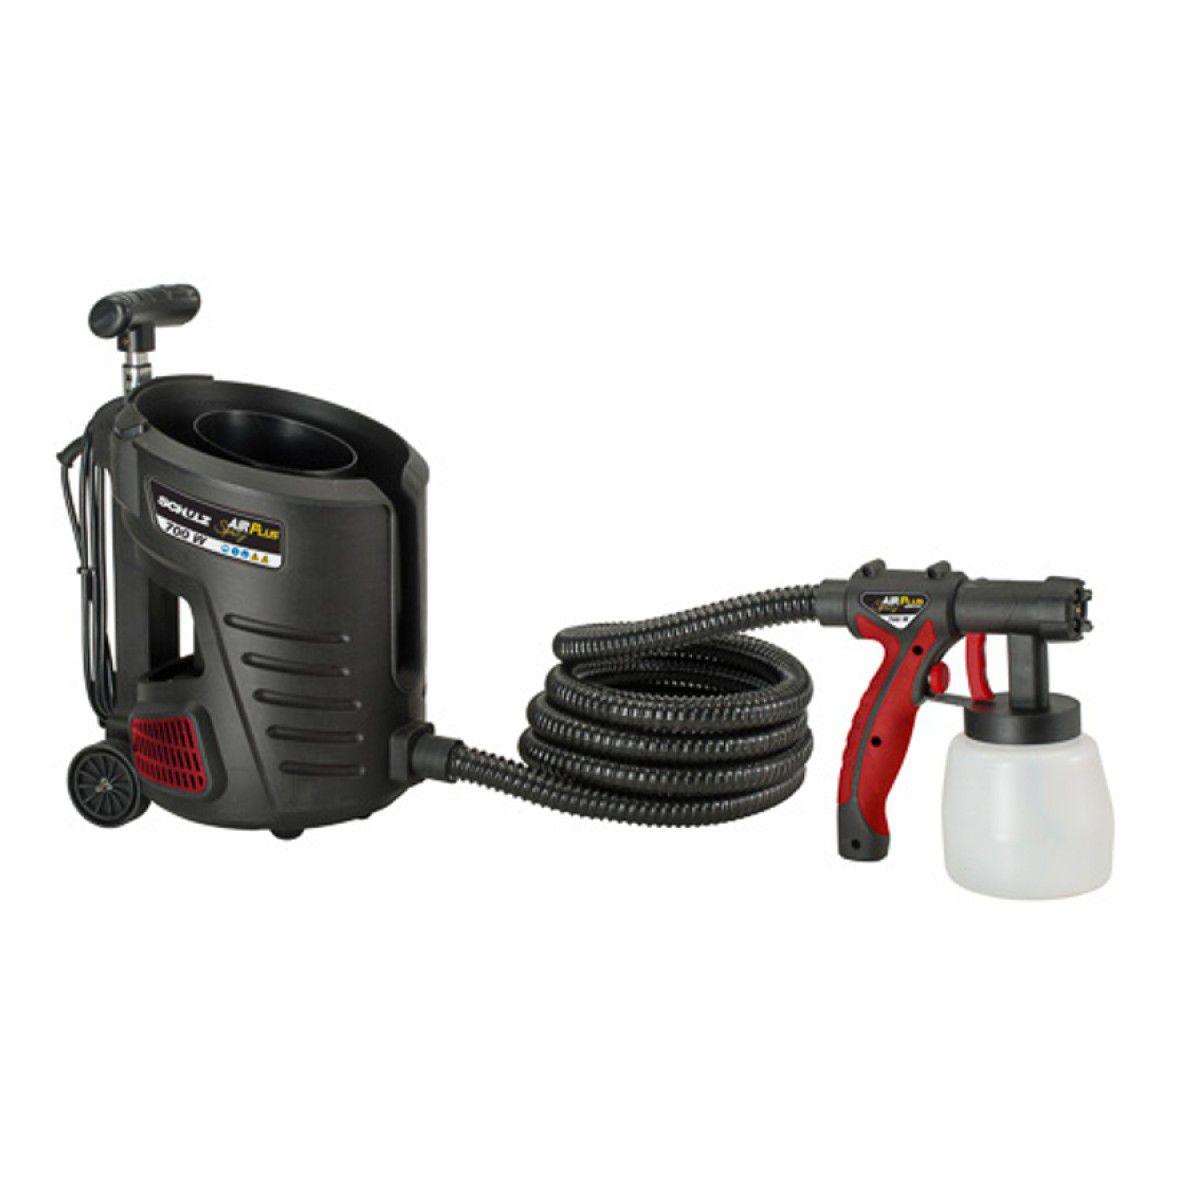 Pistola Pulverizadora Air Plus Spray 700W – Schulz